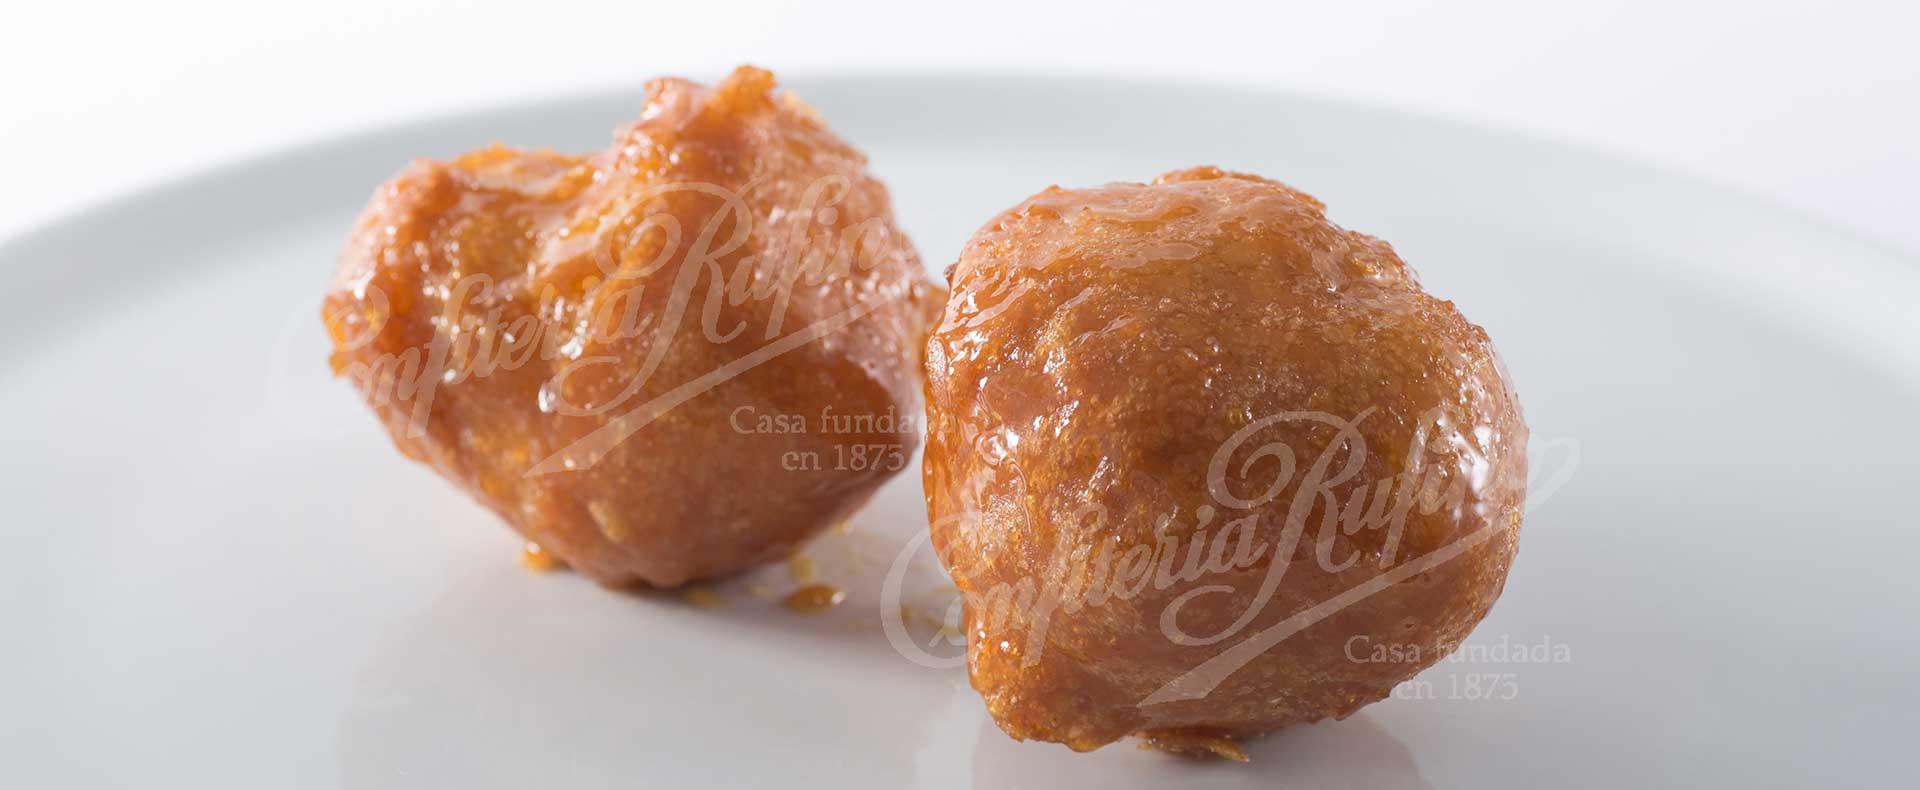 Buñuelo de viento dulce frito Semana Santa Confitería Rufino Aracena